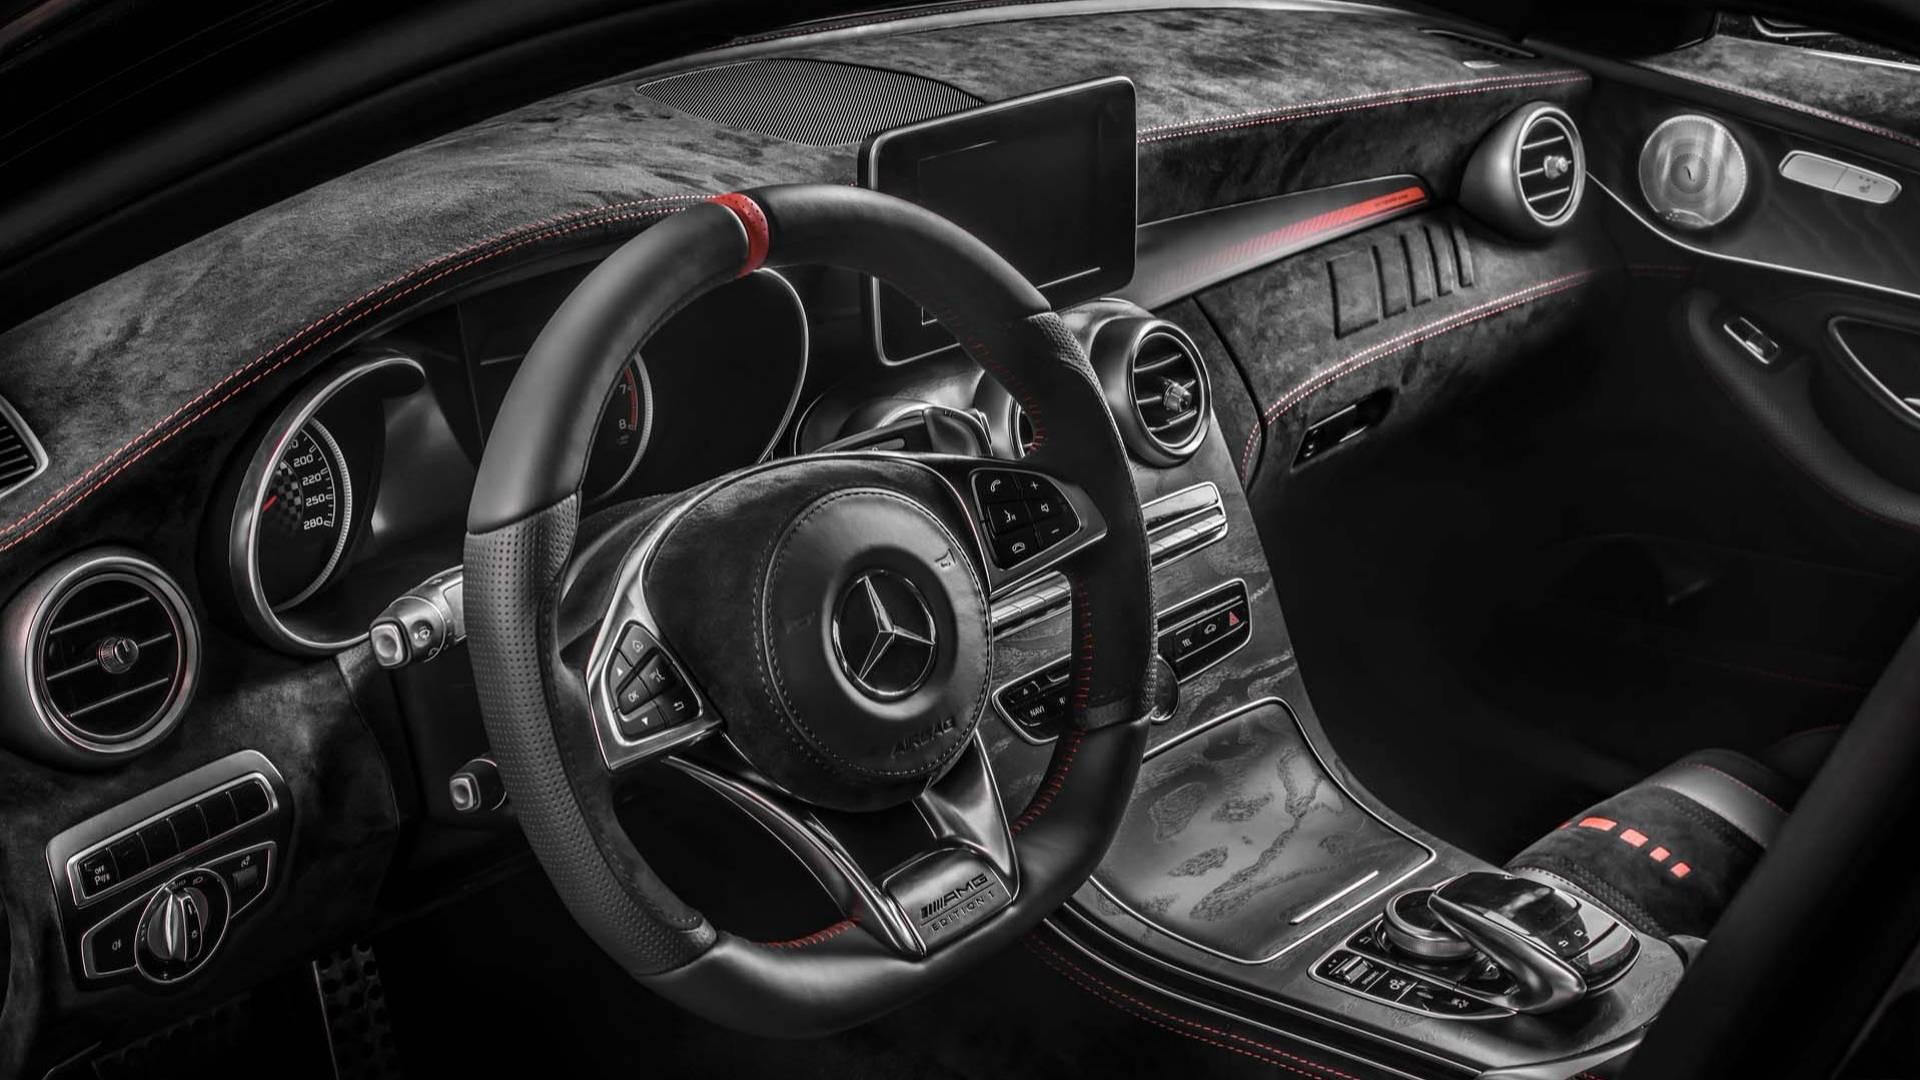 Carlex Design Kills A Mercedes Amg C43 With Swathes Of